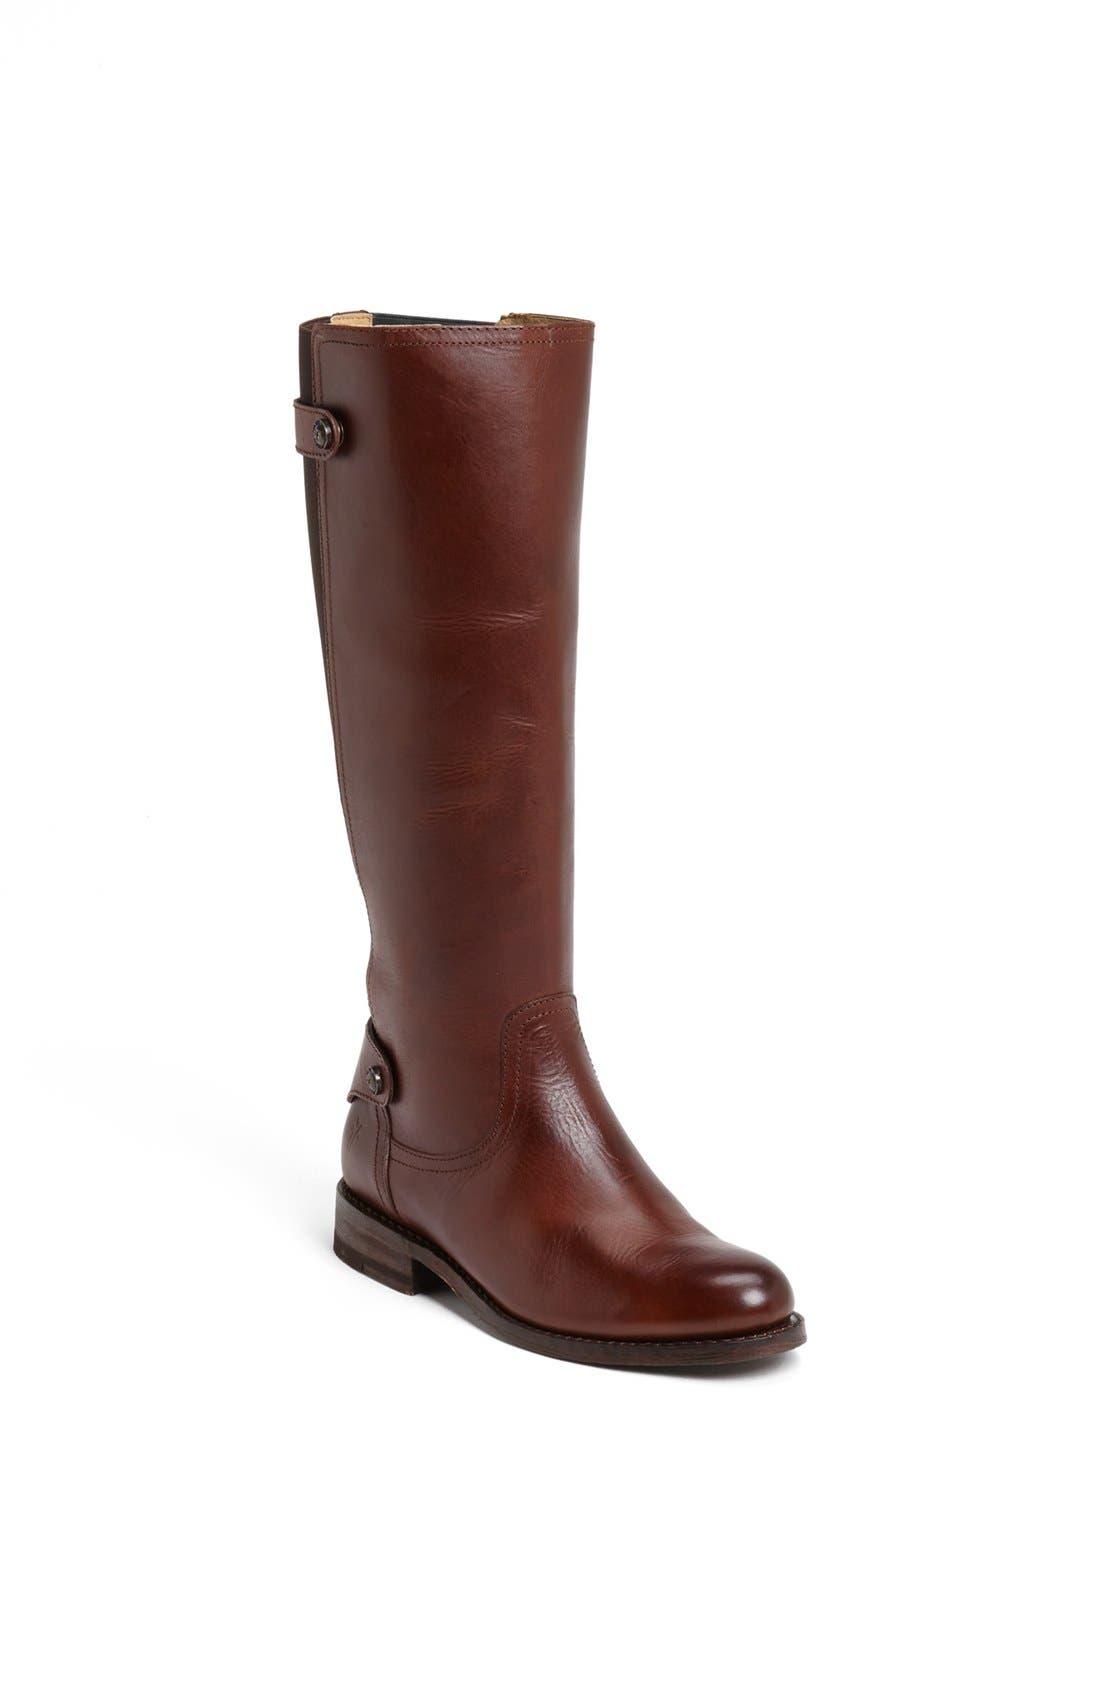 Alternate Image 1 Selected - Frye 'Jayden' Back Gore Leather Boot